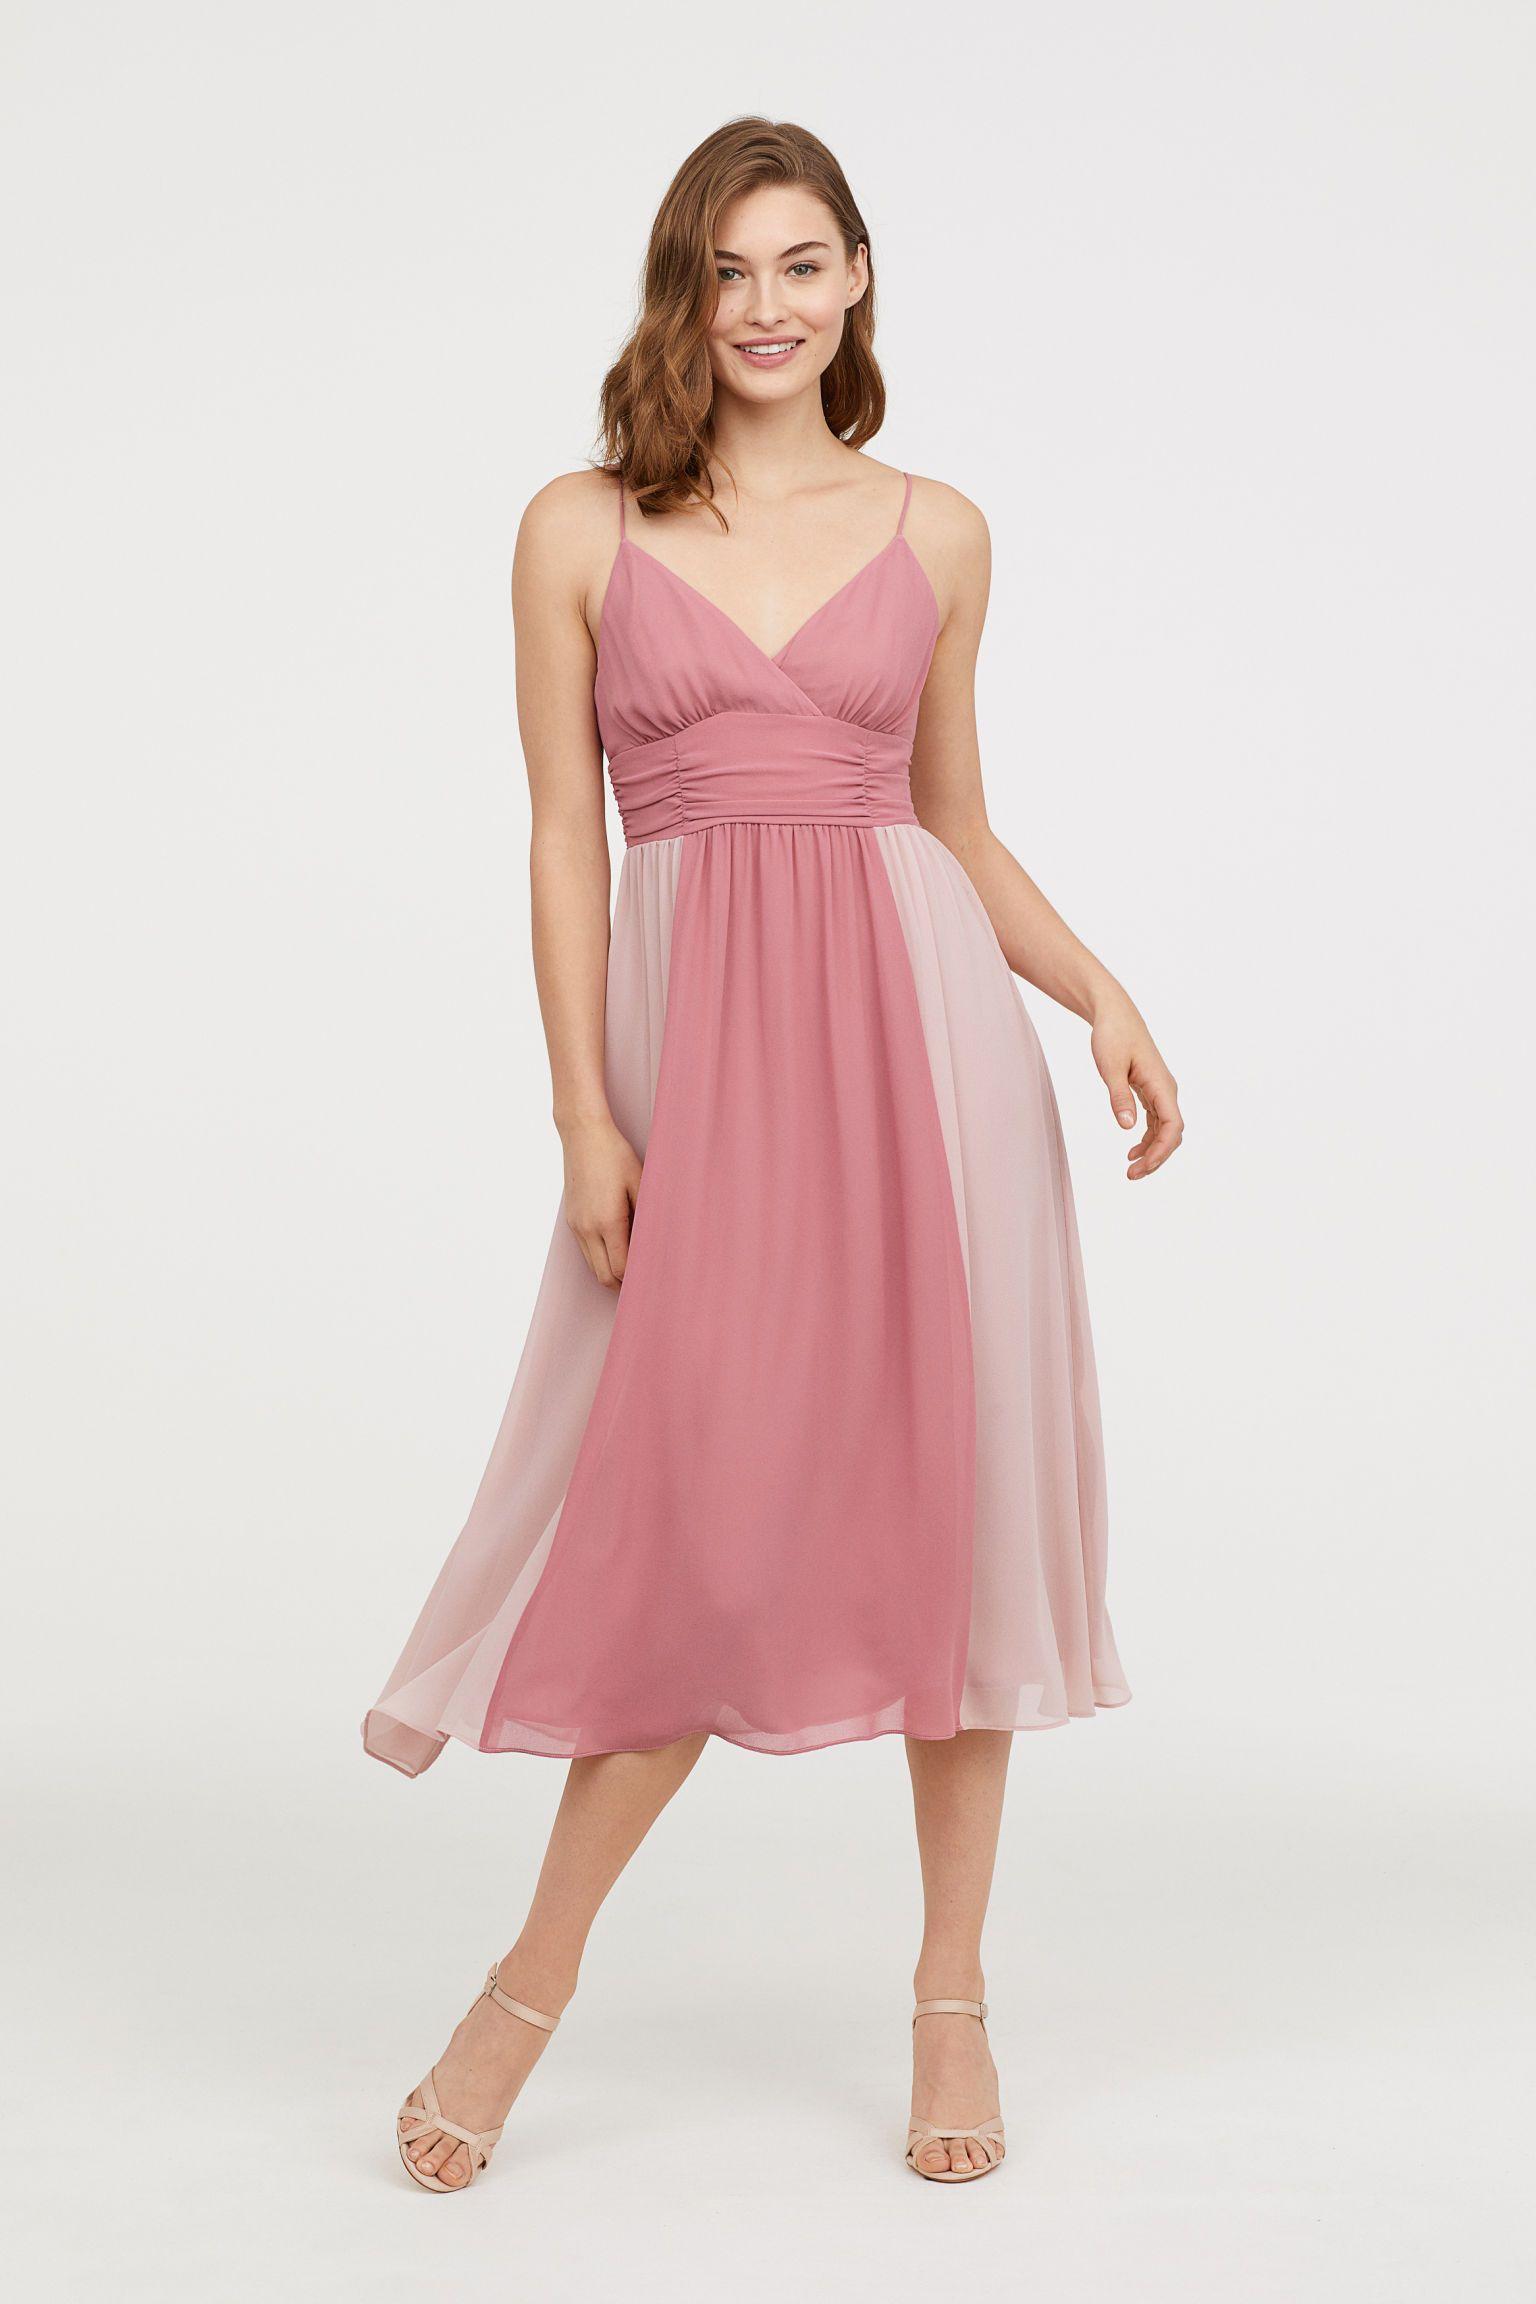 H&M V-neck Dress - Pink   Pinterest